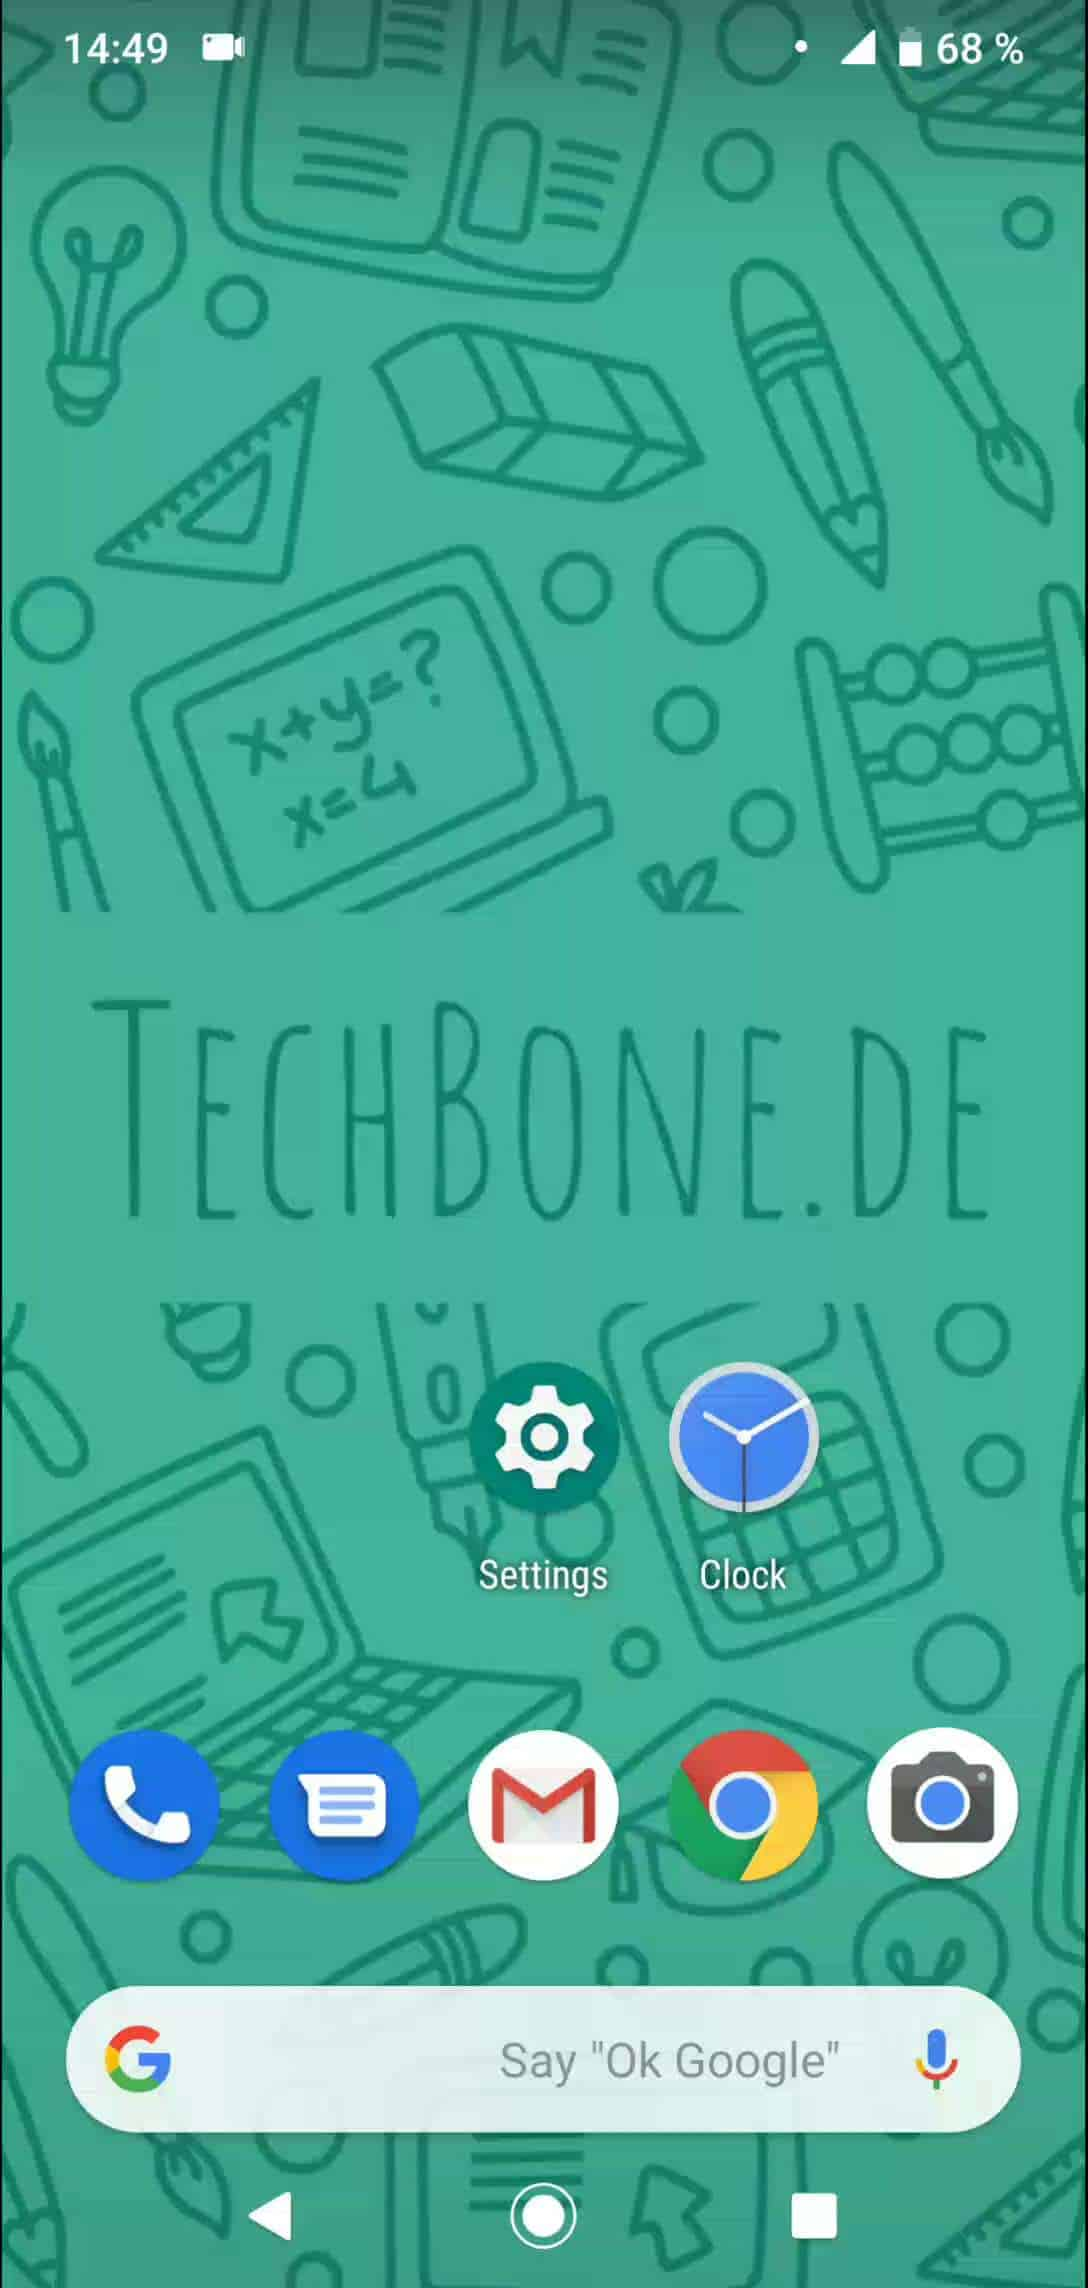 Gradually increase alarm volume - Android 9 | TechBone